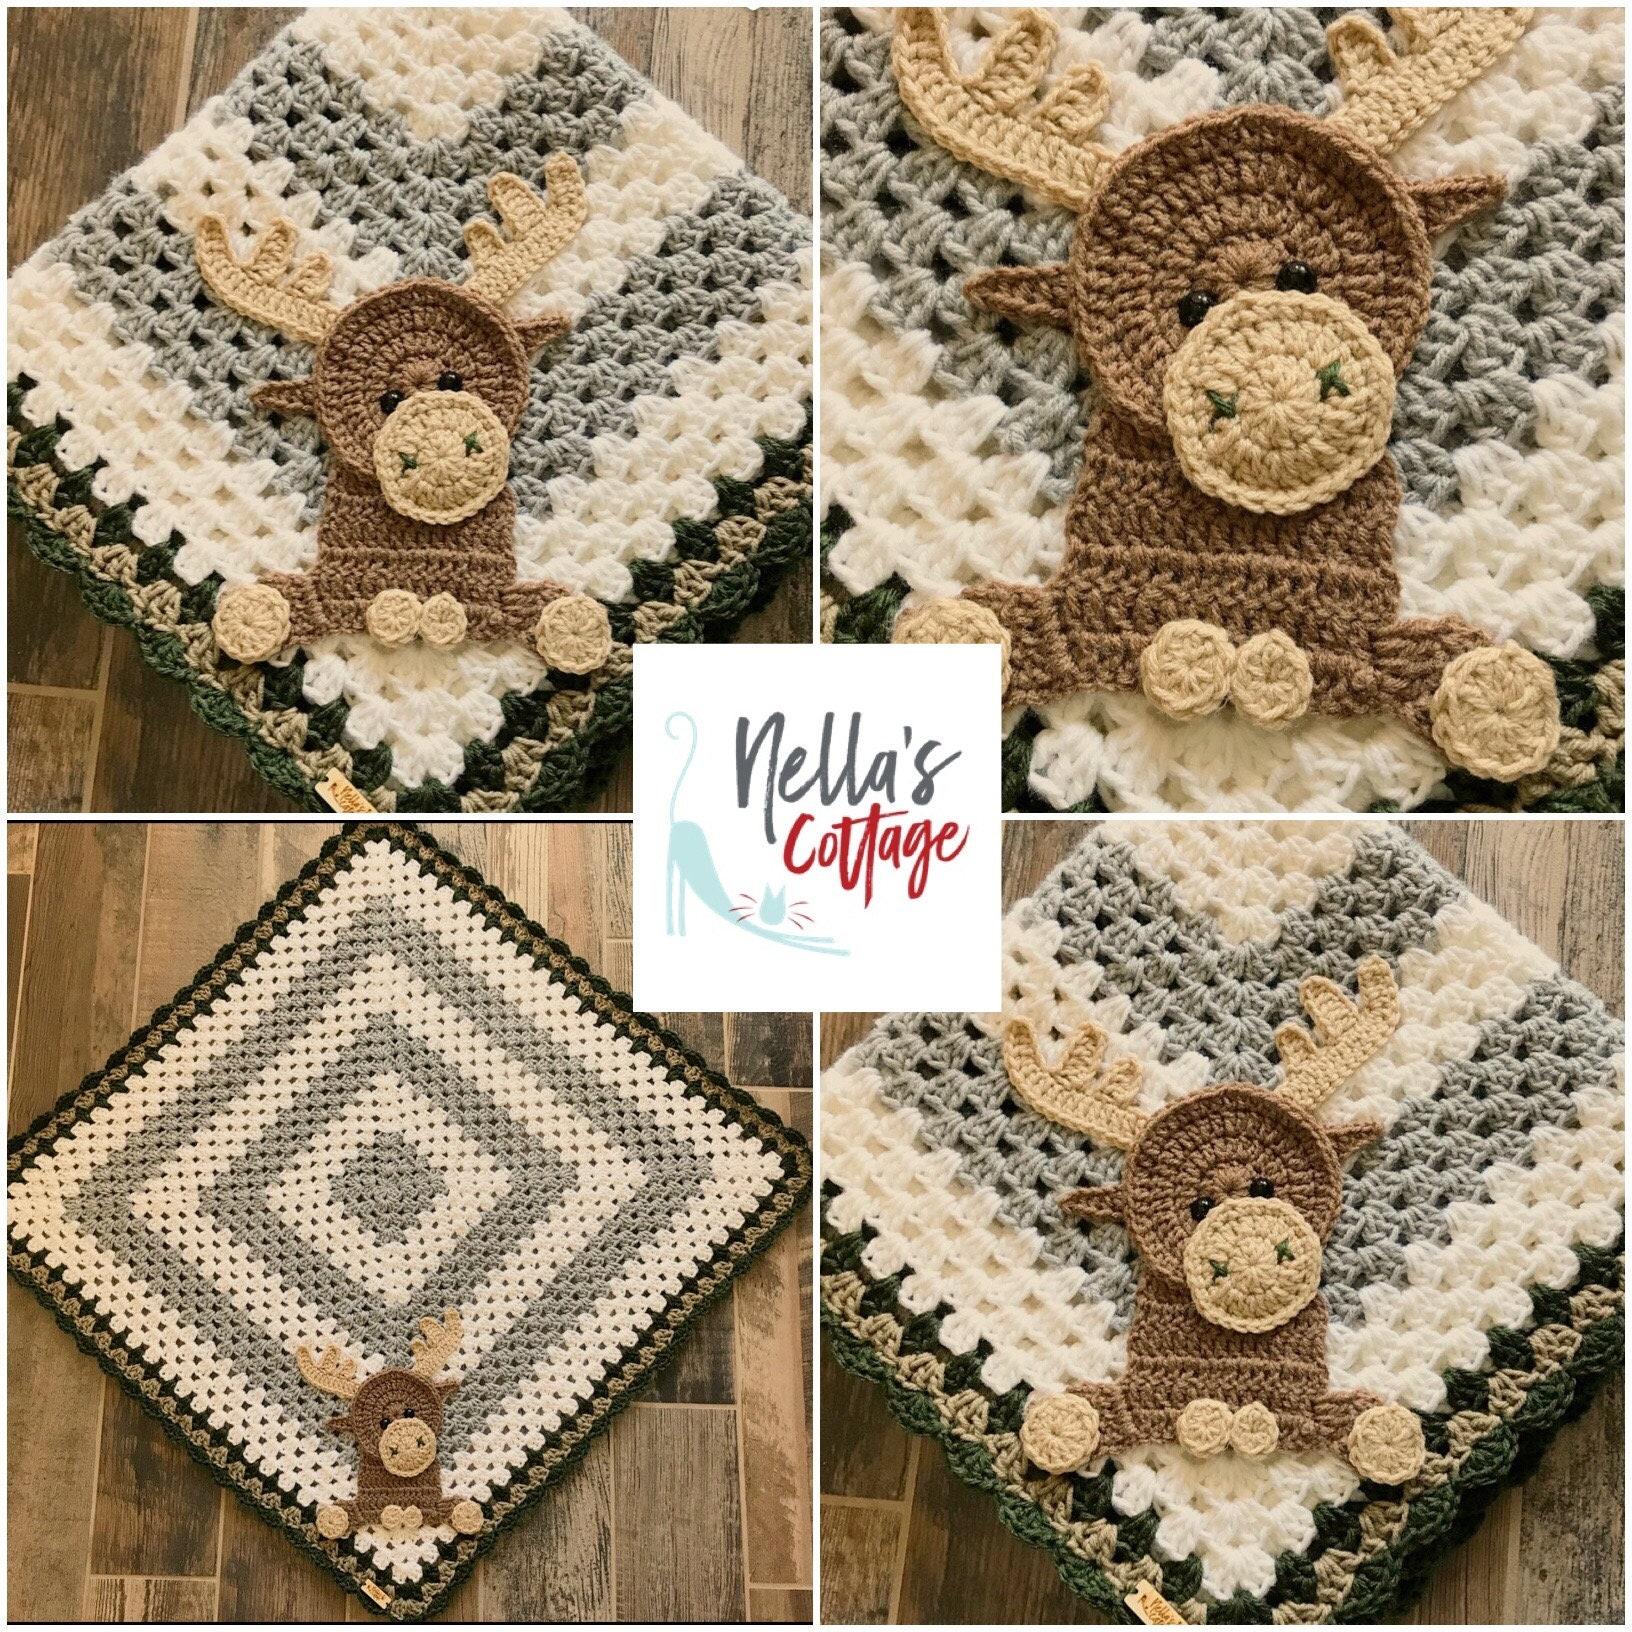 Crochet Baby Blankets For Sale Ireland